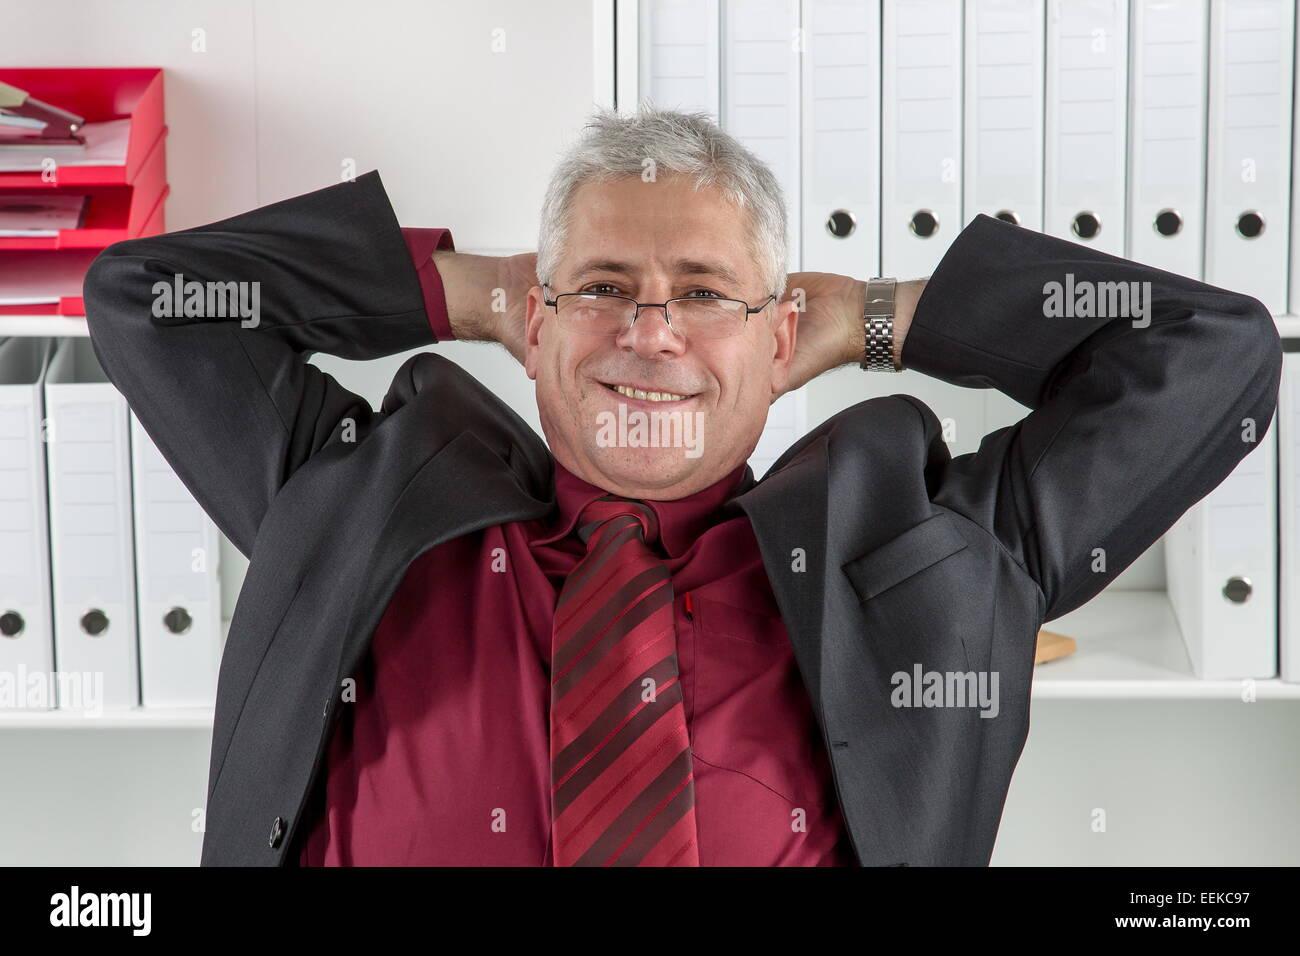 Mann mittleren Alters sitzt im Büro und relext, Middle-aged man sitting in an office, relaxing - Stock Image